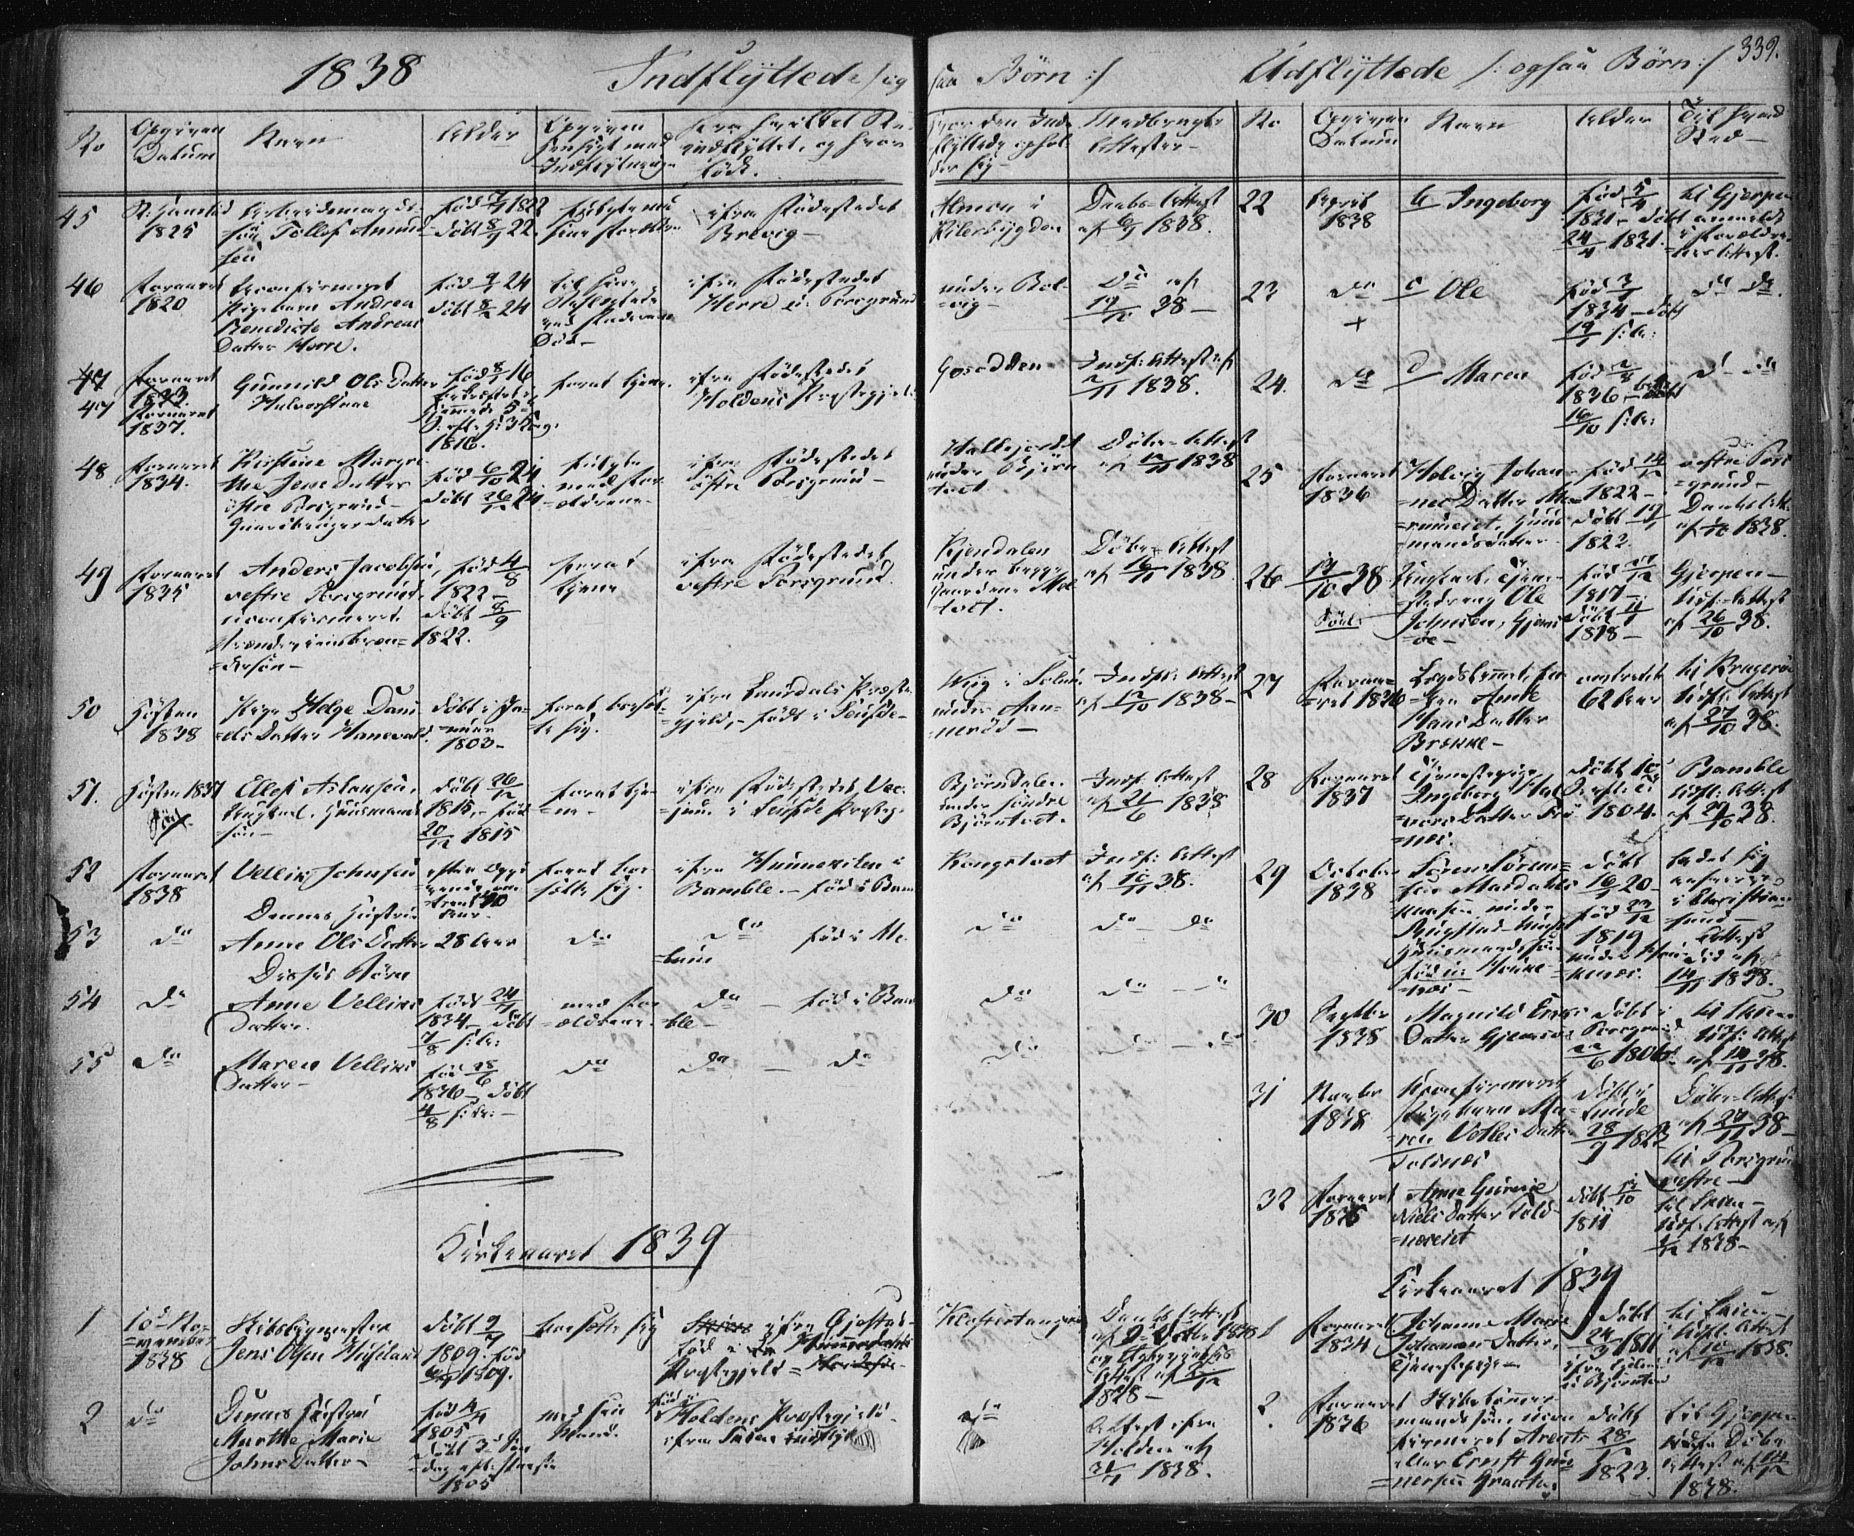 SAKO, Solum kirkebøker, F/Fa/L0005: Ministerialbok nr. I 5, 1833-1843, s. 339